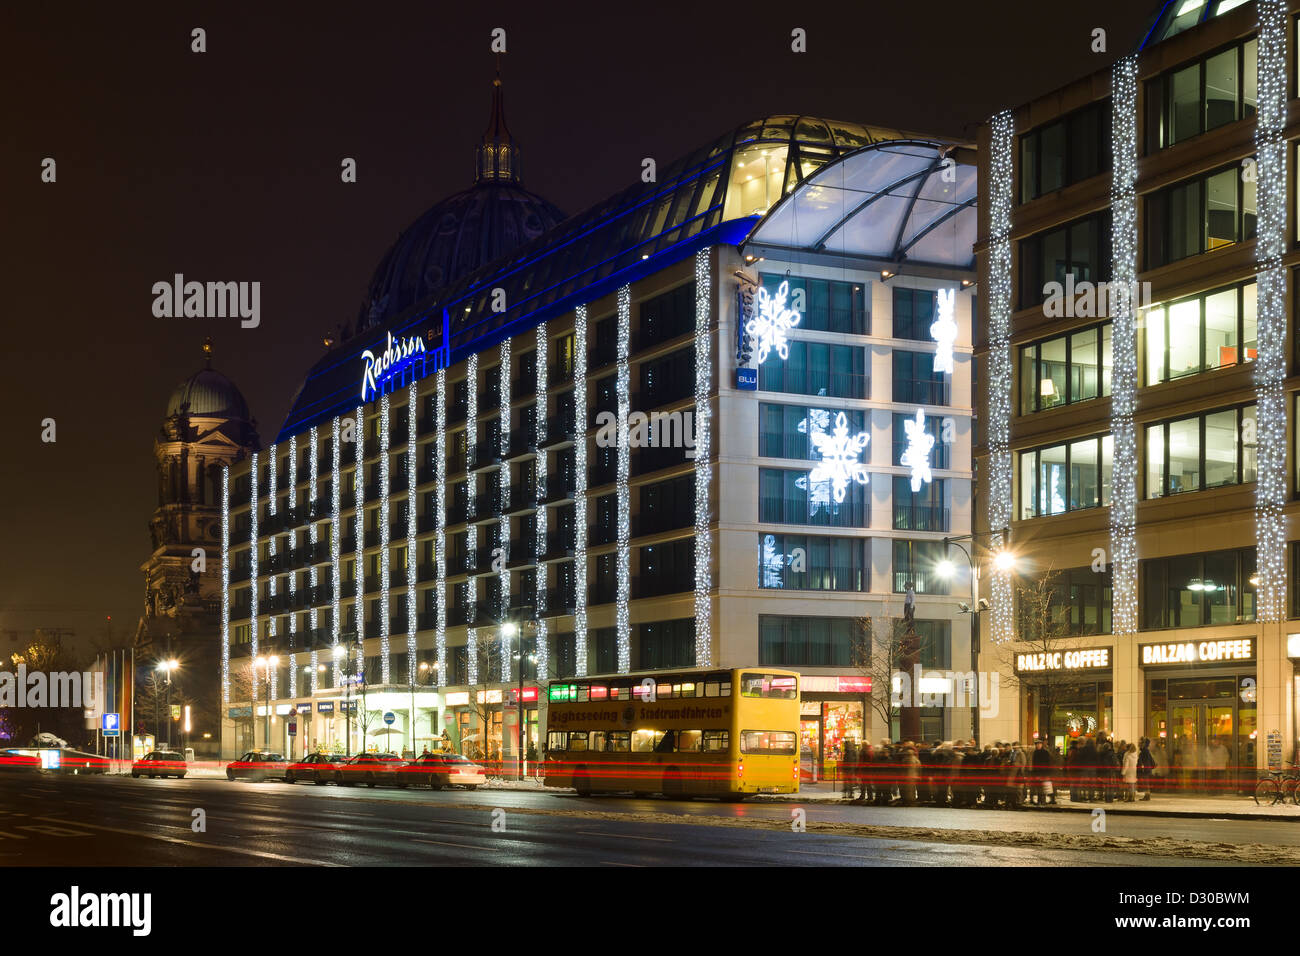 The Radisson Blu Hotel in the Christmas illuminations - Stock Image